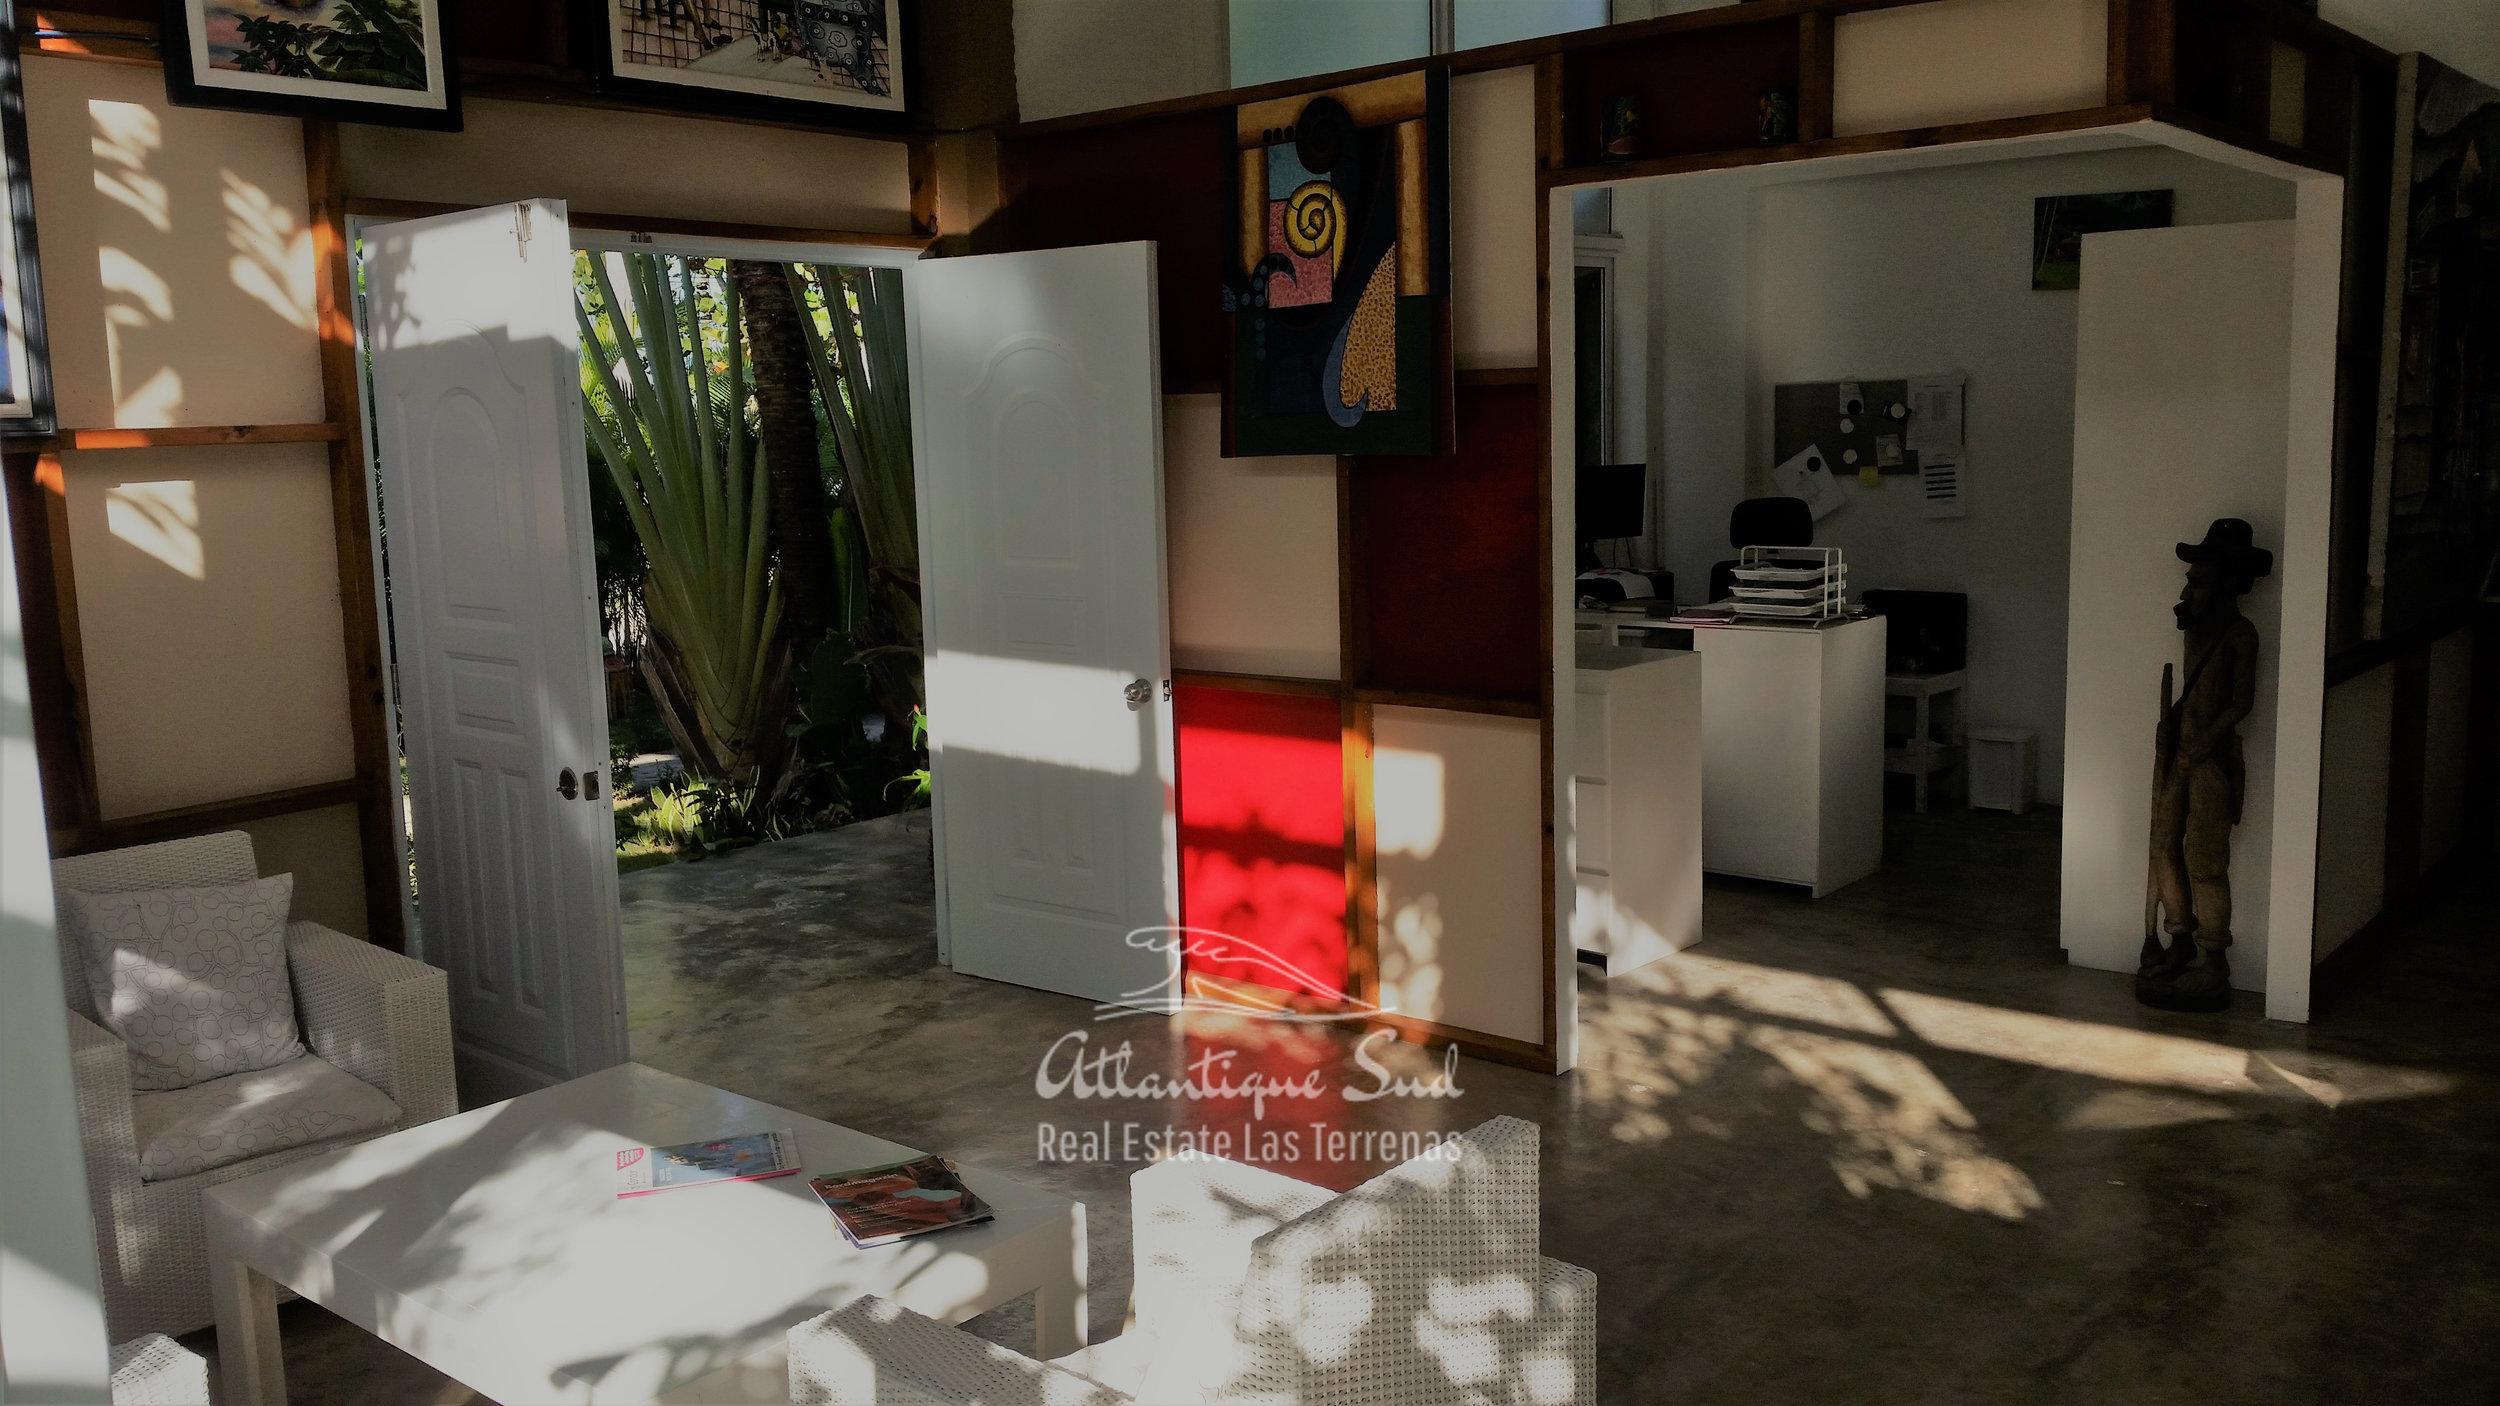 Small hotel for sale next to the beach Real Estate Las Terrenas Atlantique Sud Dominican Republic20.jpg